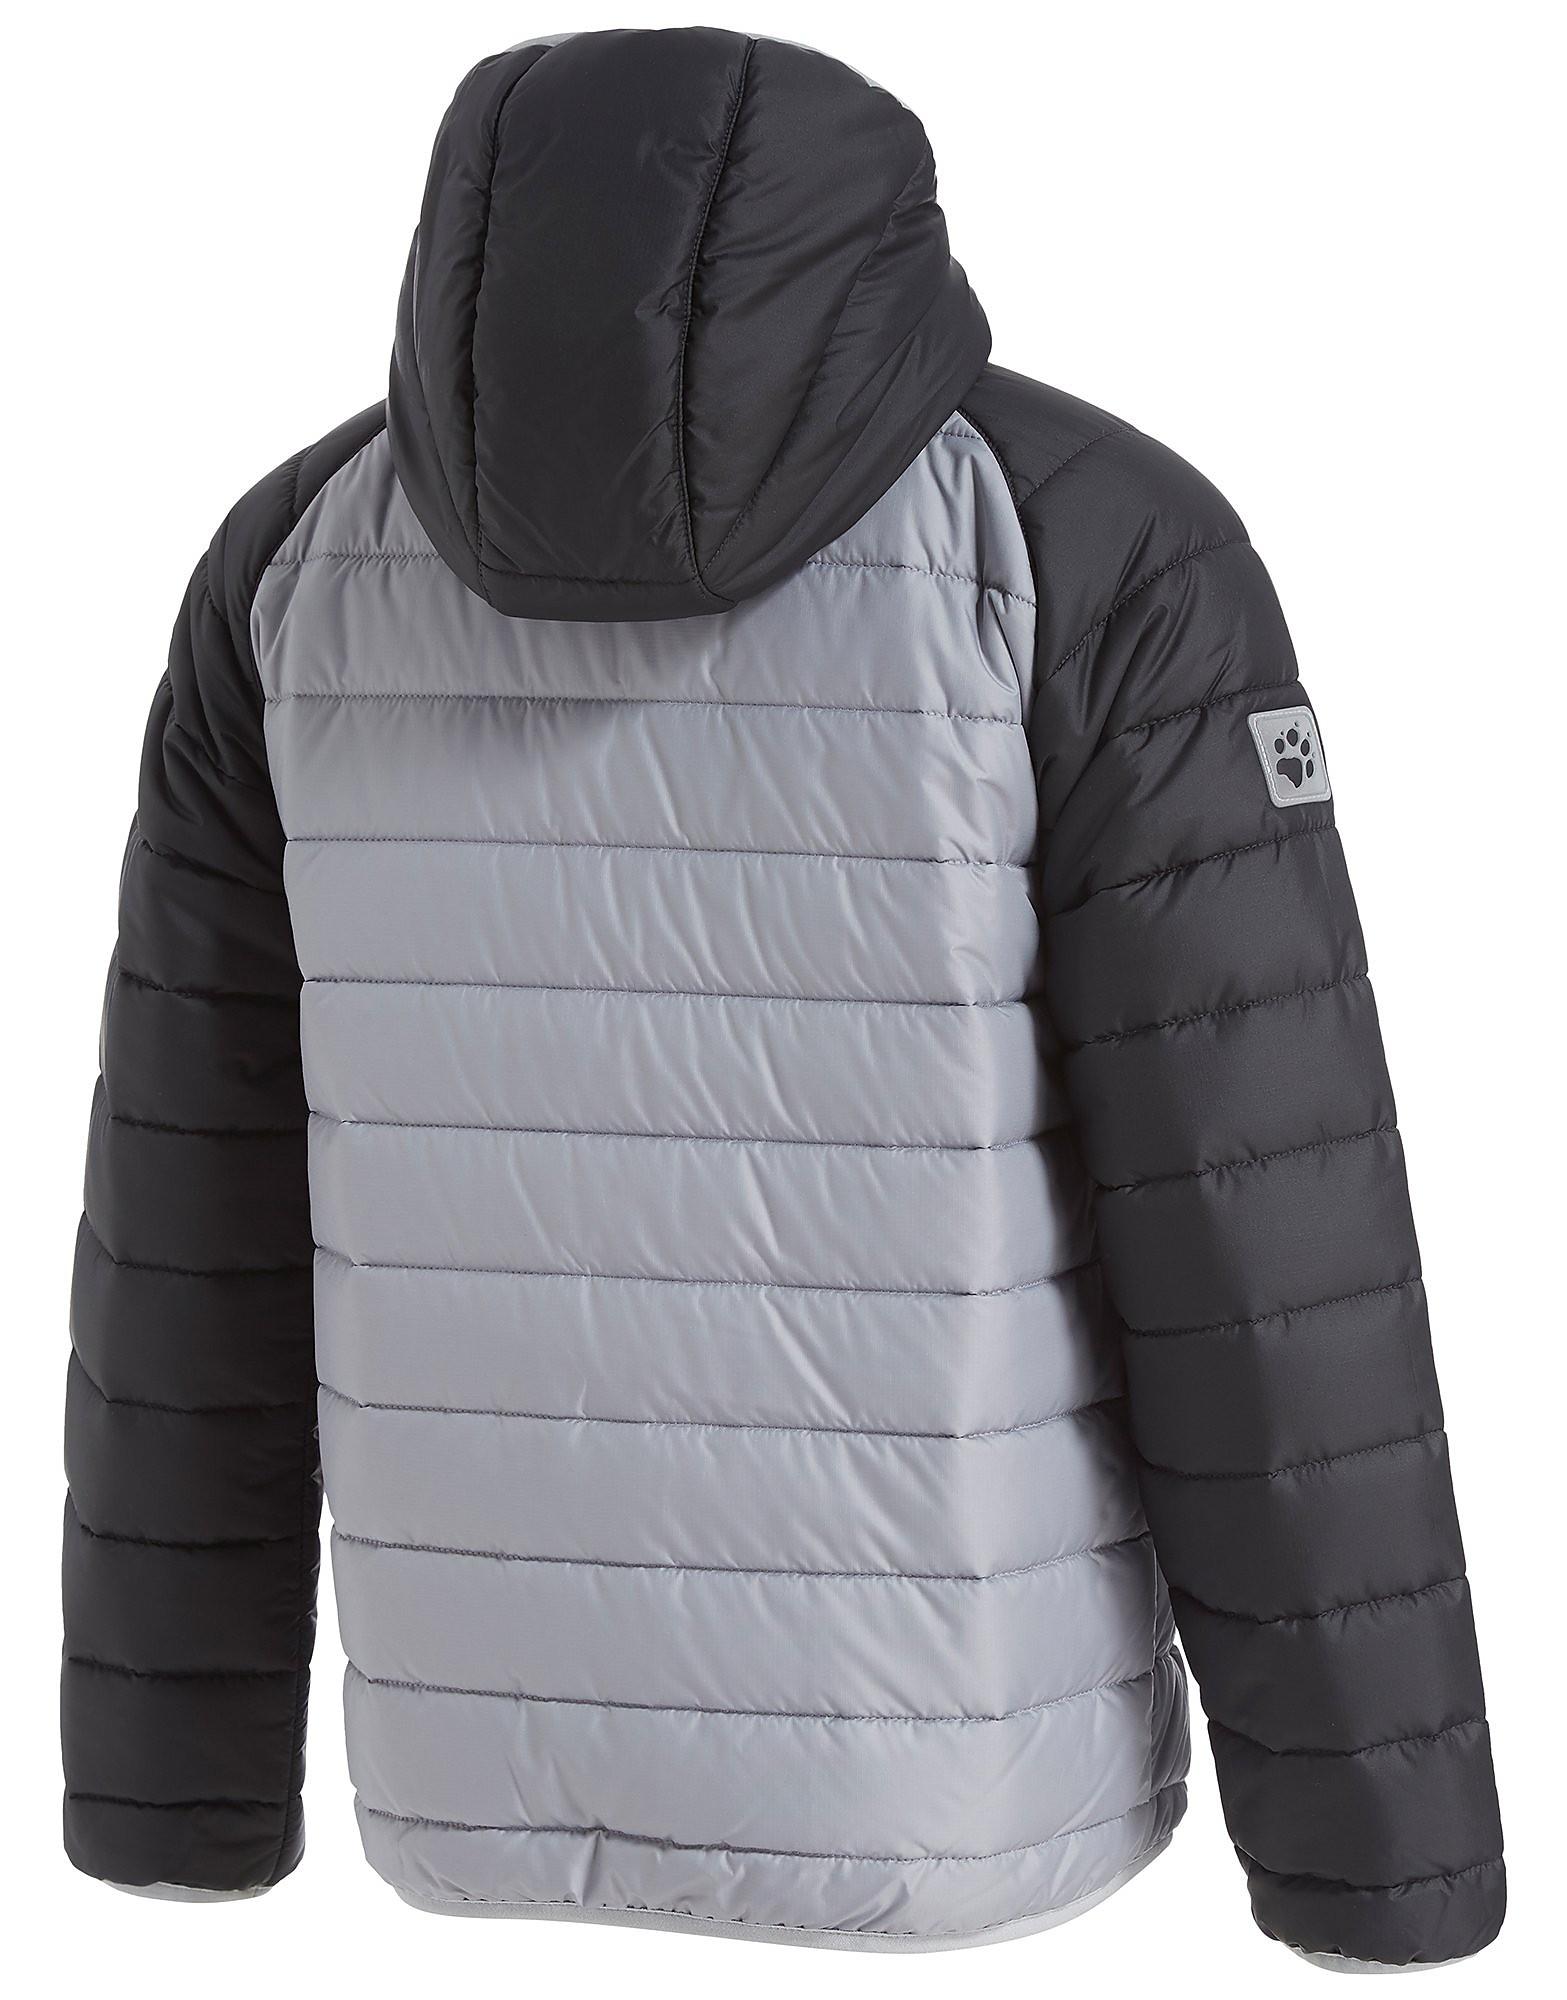 Jack Wolfskin Zenon Insulated Jacket Junior